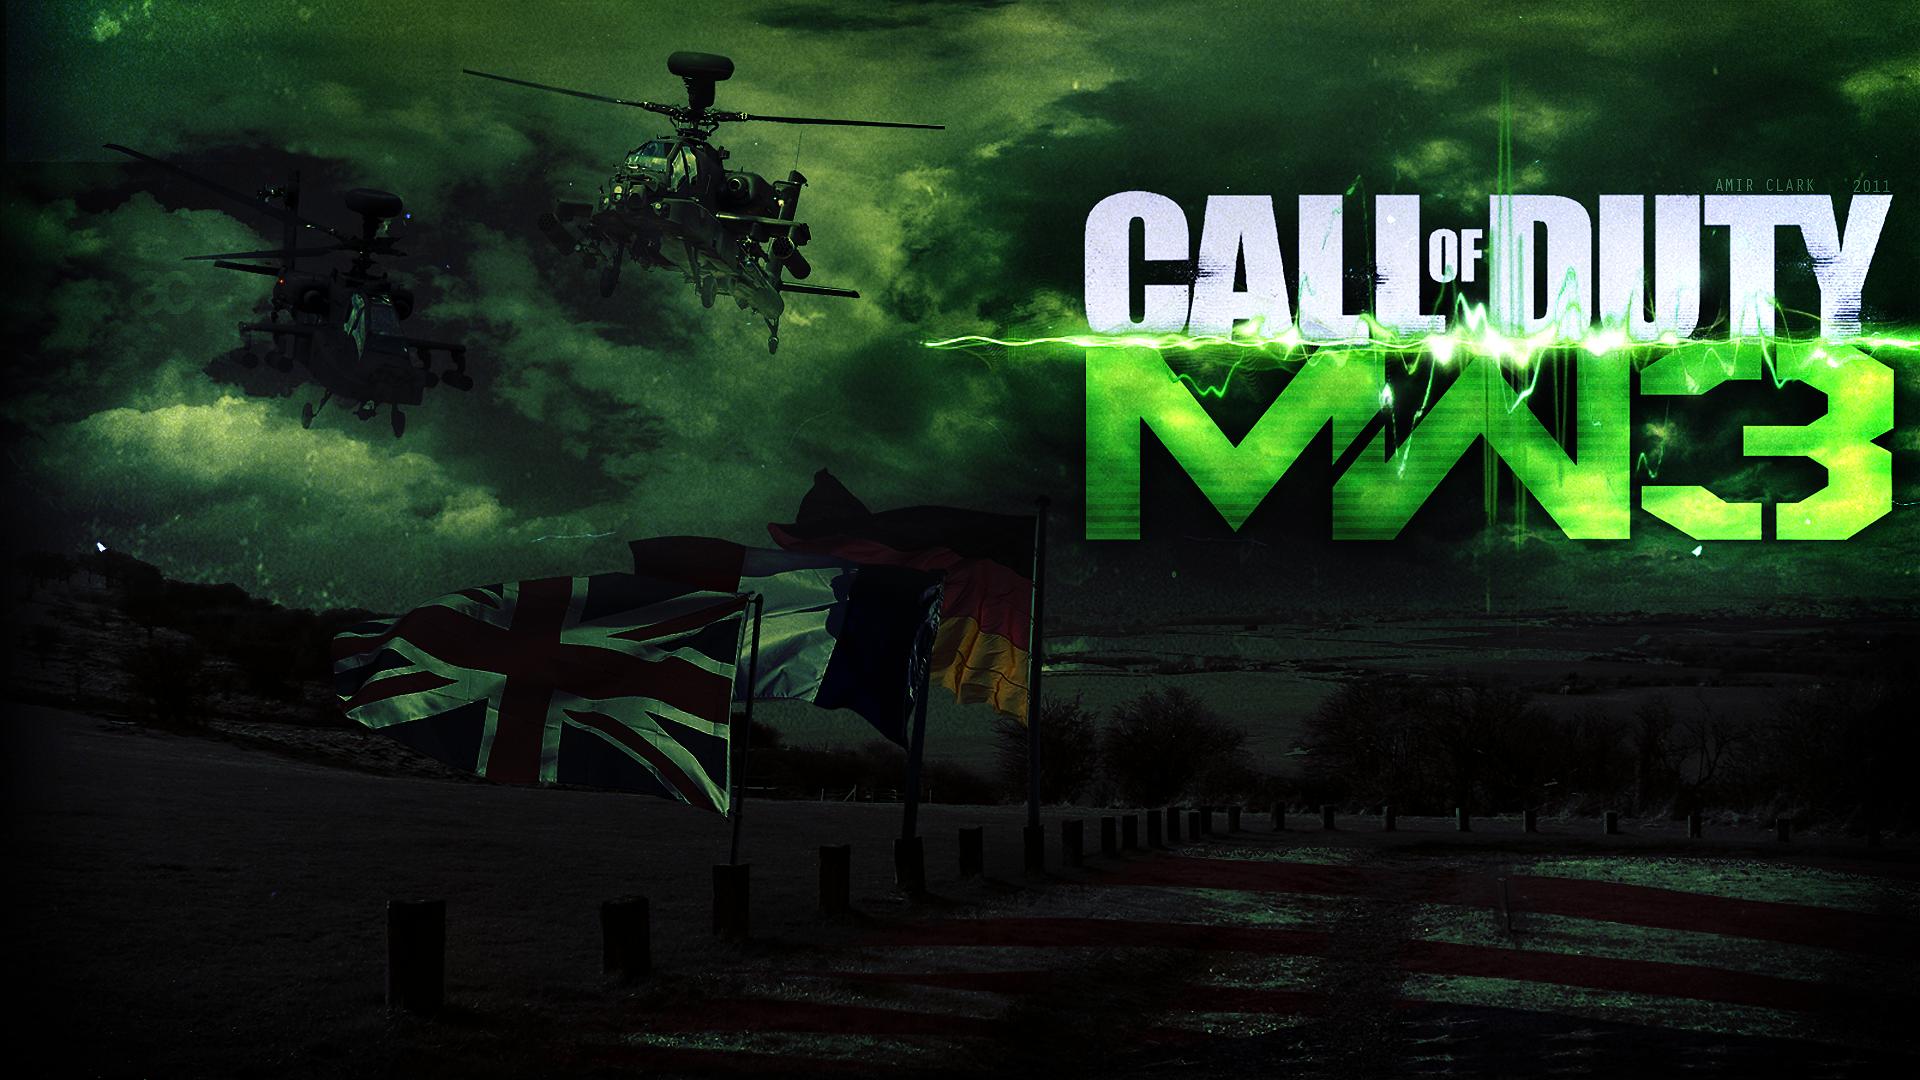 Call Of Duty Modern Warfare 3 Sayfa 12 Uludag Sozluk Call Of Duty Modern Warfare World Of Warcraft Gold